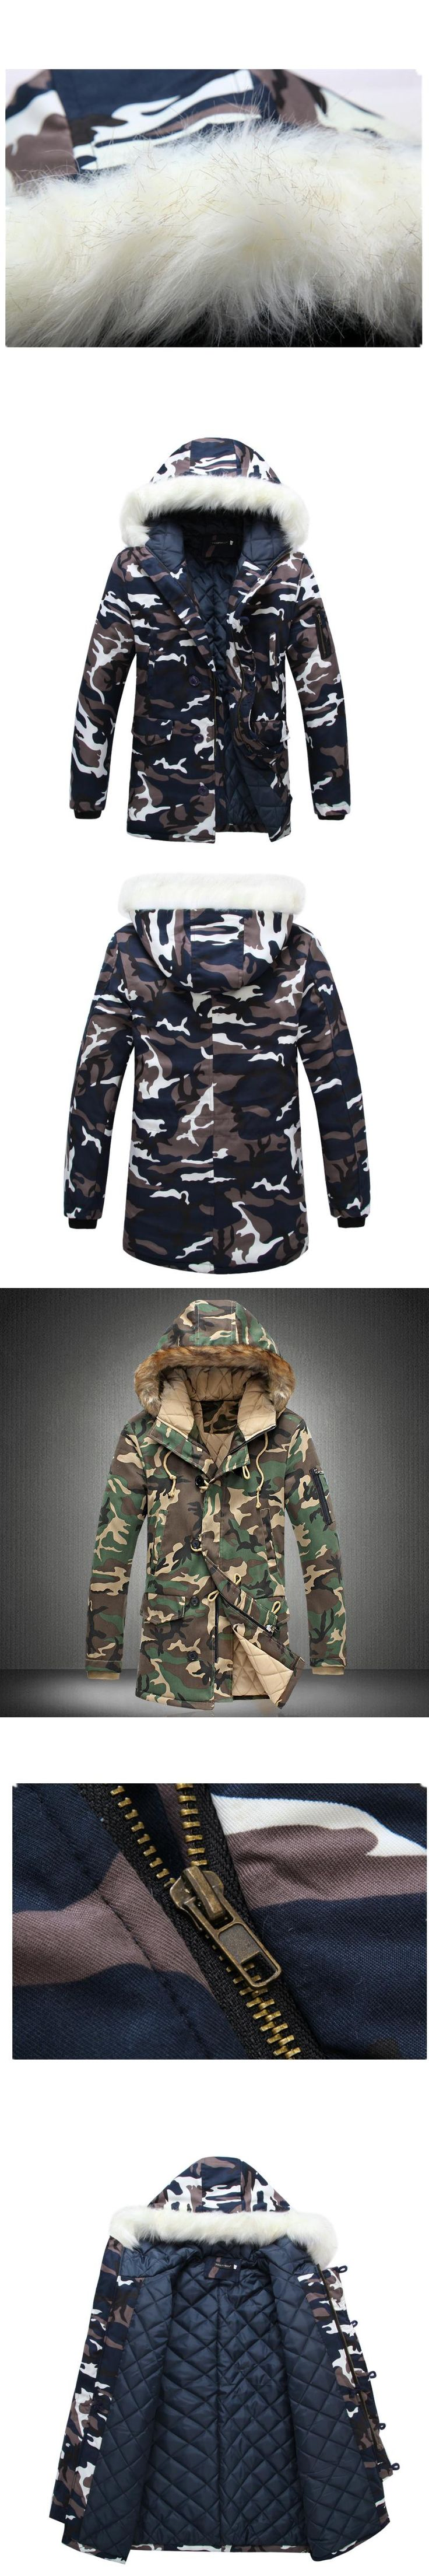 Camouflage Down Parkas Jackets  2017 Men's Parka Hooded Coat Male Fur Collar Parkas Winter Jacket Men Military Down Overcoat